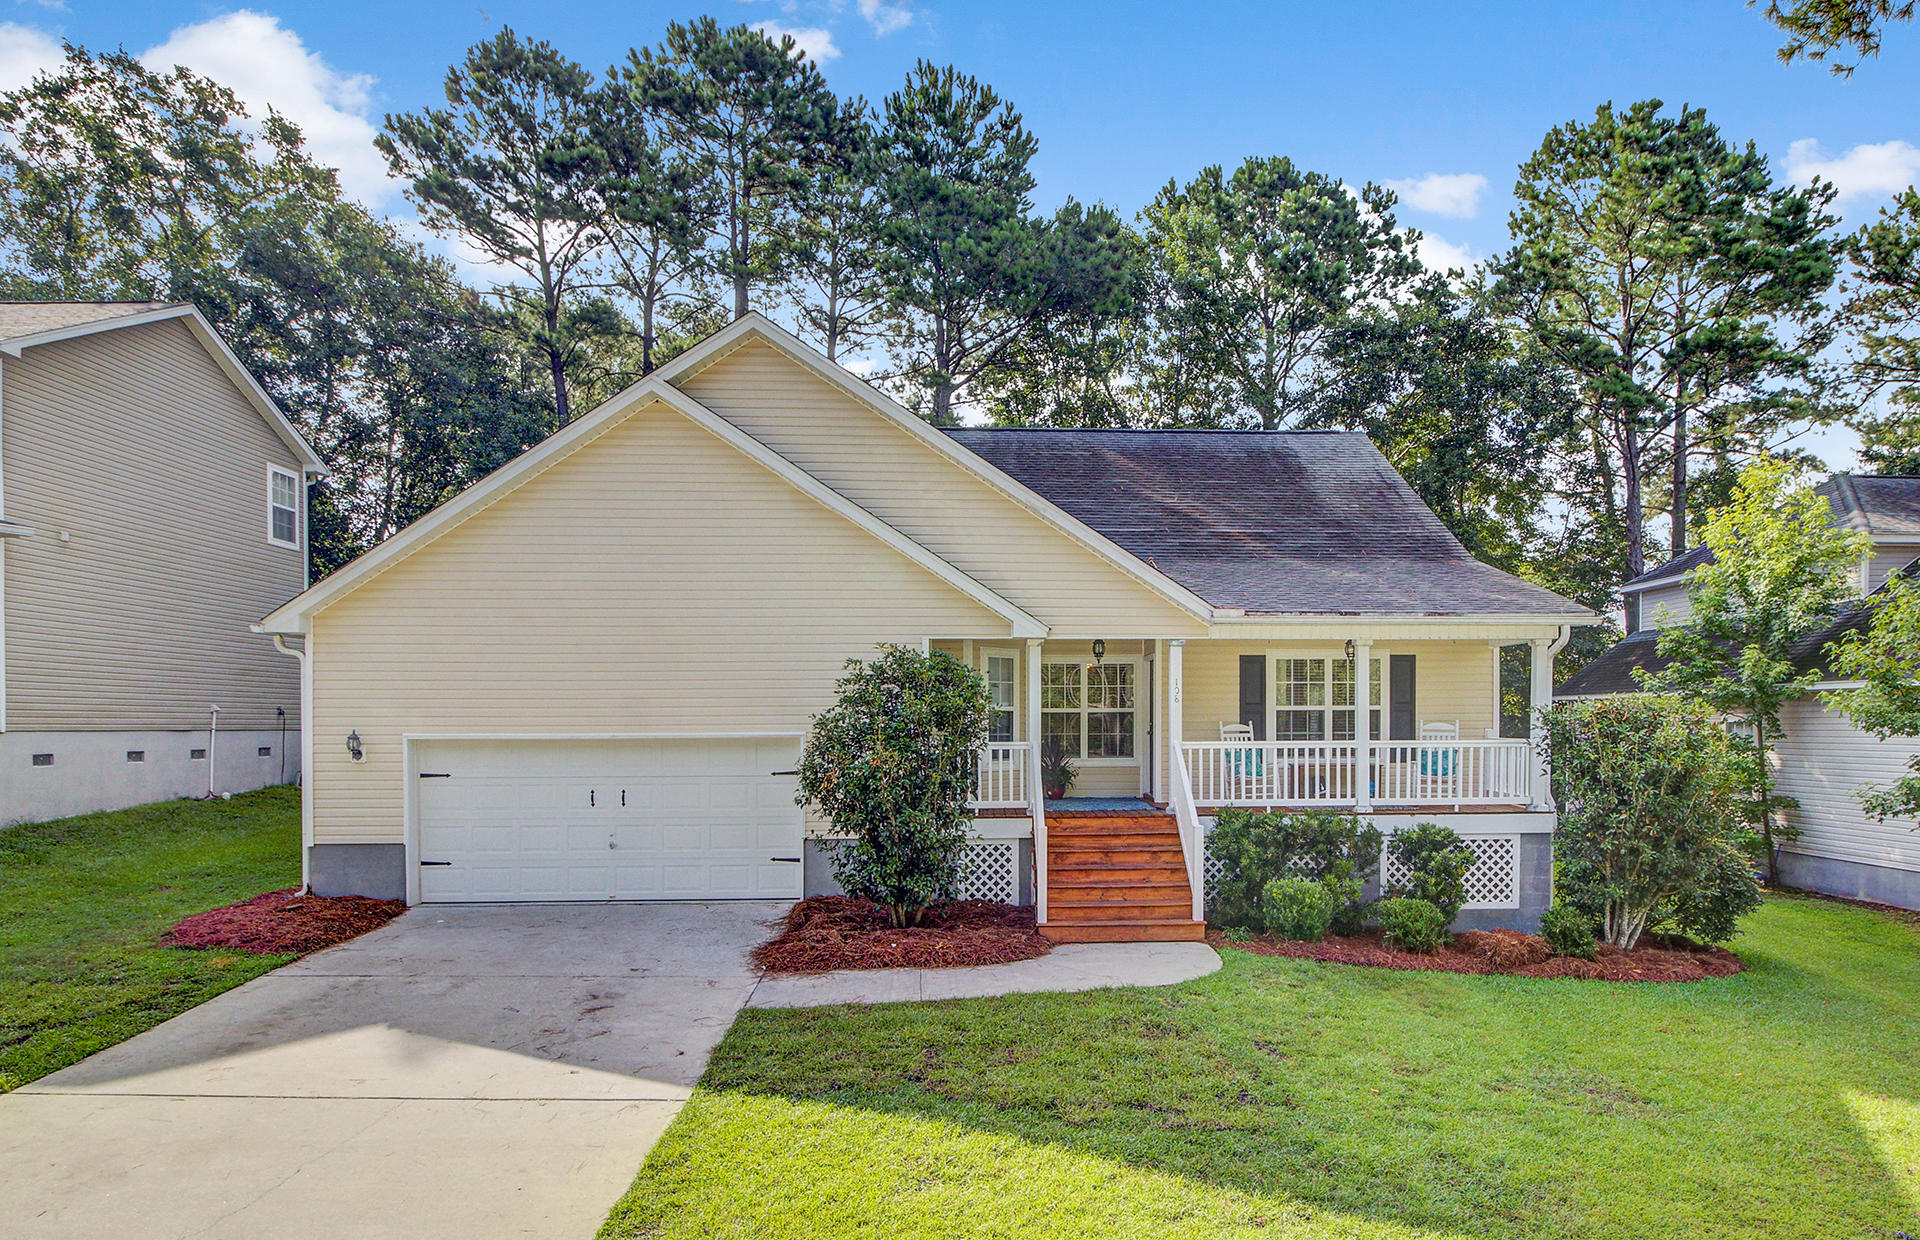 Kennsington Homes For Sale - 108 Heatherlock, Hanahan, SC - 33